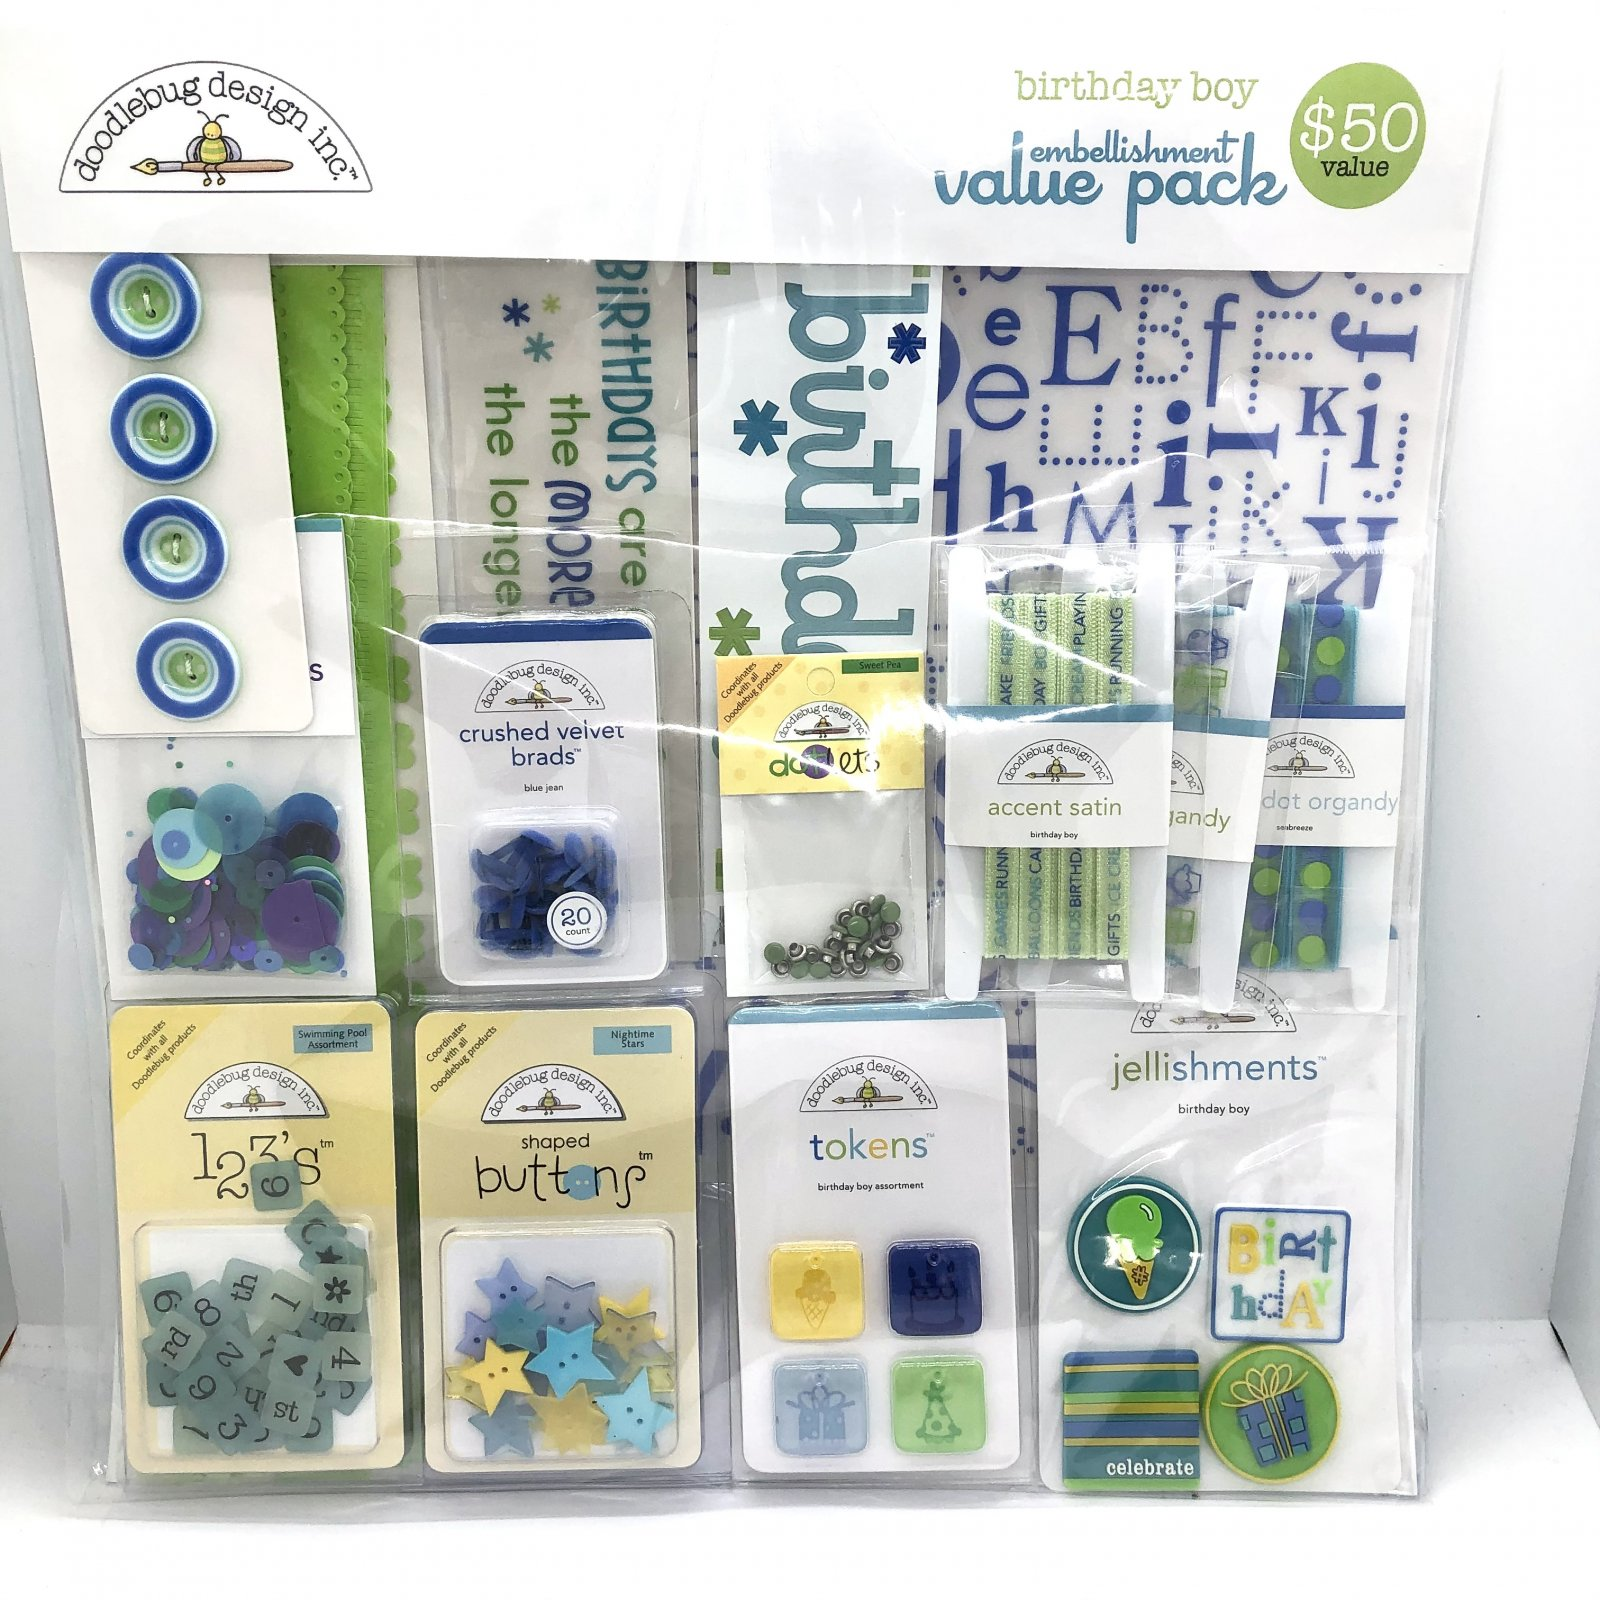 Doodlebug Designs Birthday Boy Embellishment Value Pack